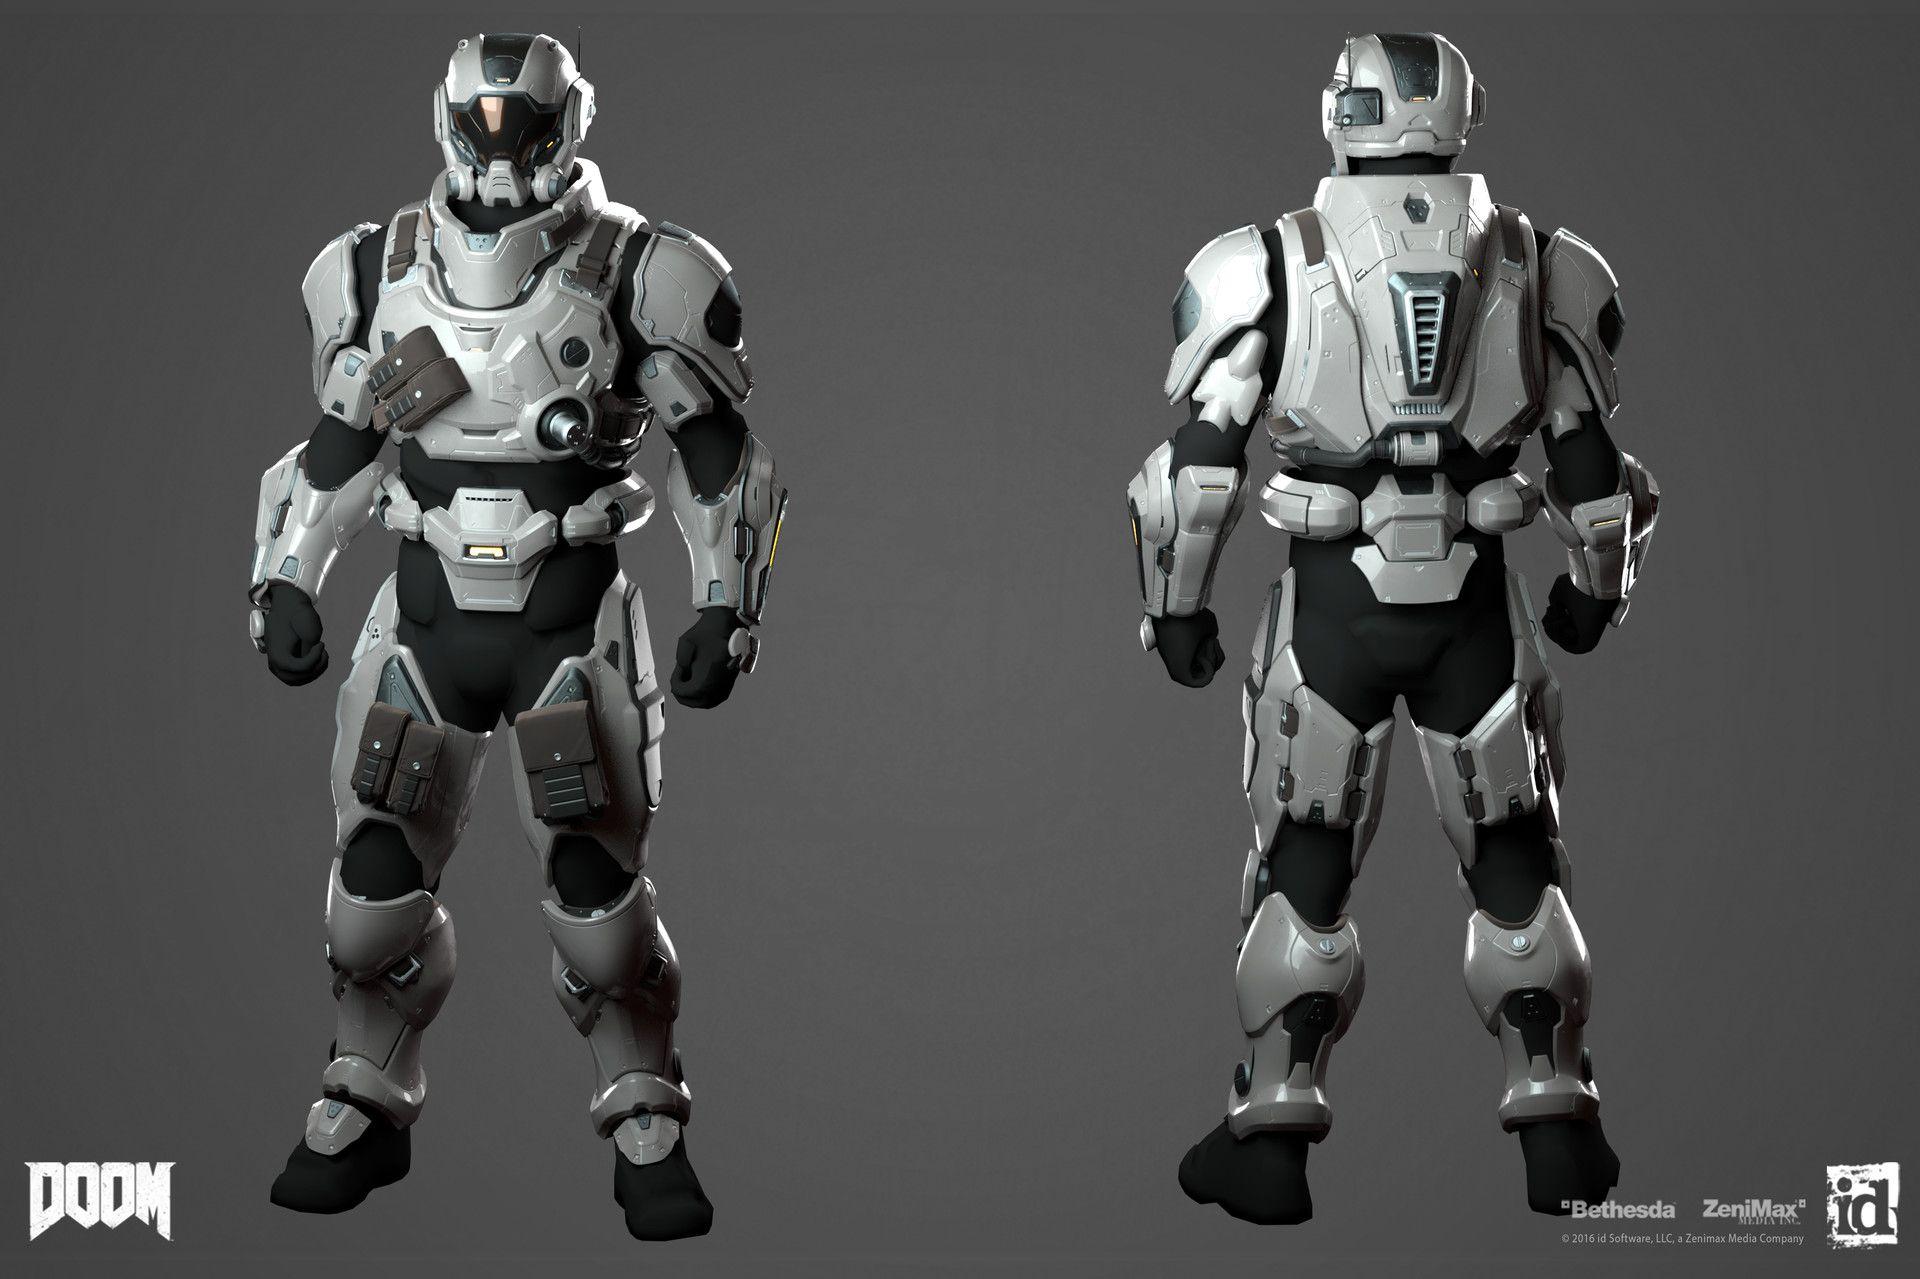 ArtStation - DOOM - Uac Armorset 03, Emanuel Palalic | Sci